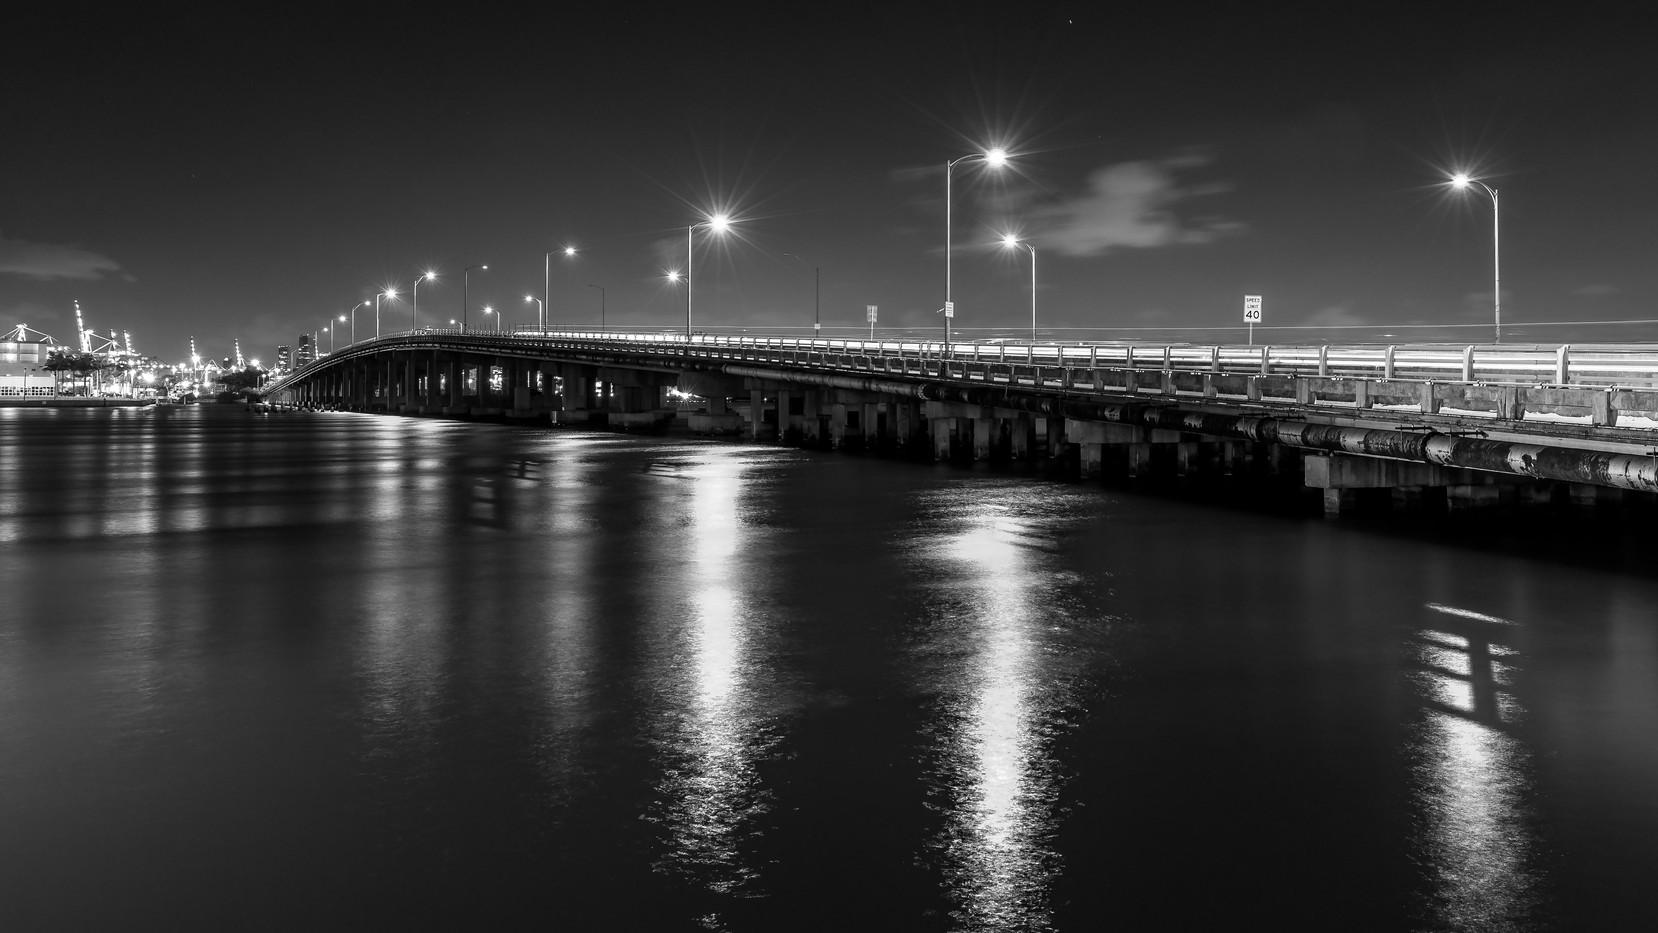 MacArtur Causeway Bridge